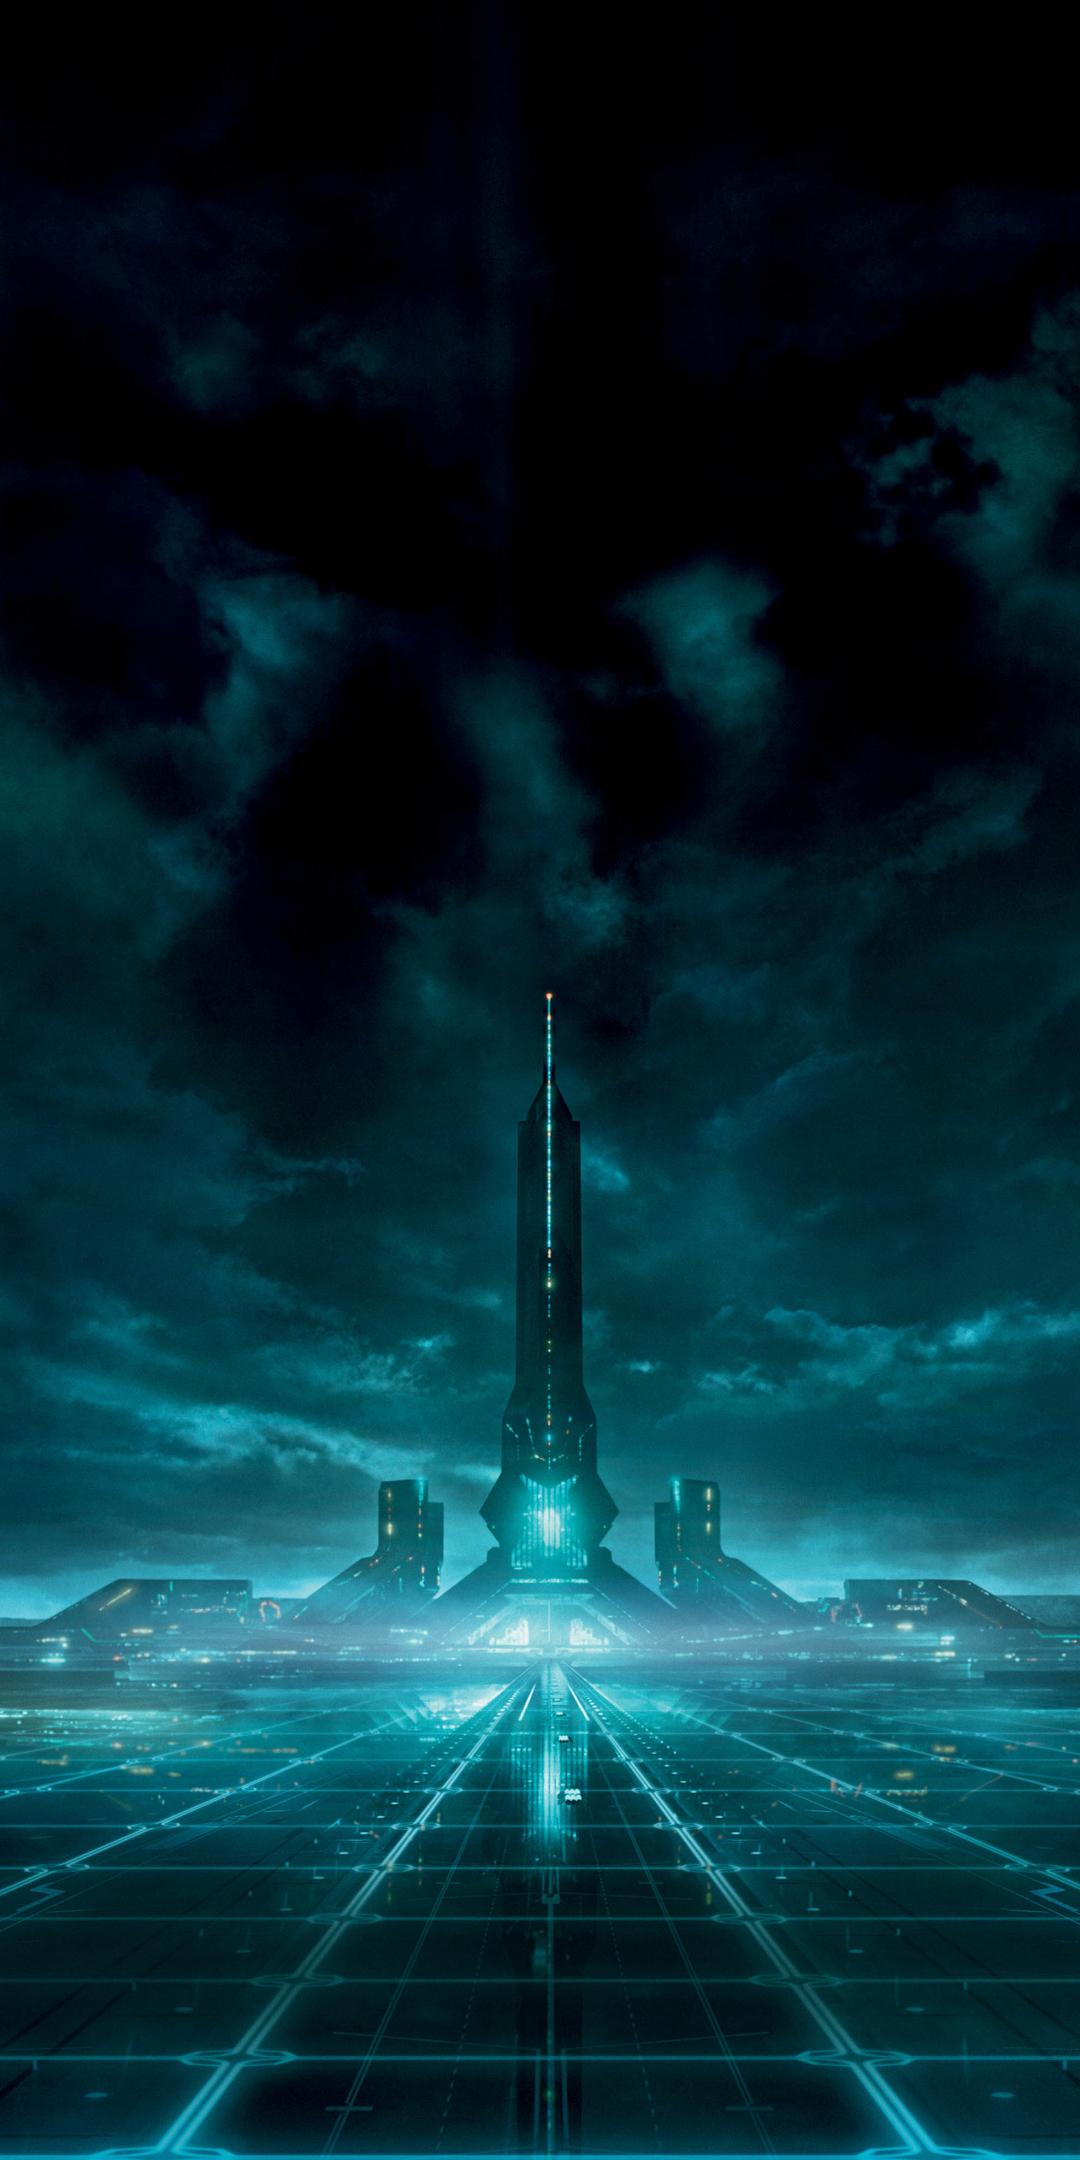 Wallpaper - Tron Legacy Clu Poster , HD Wallpaper & Backgrounds